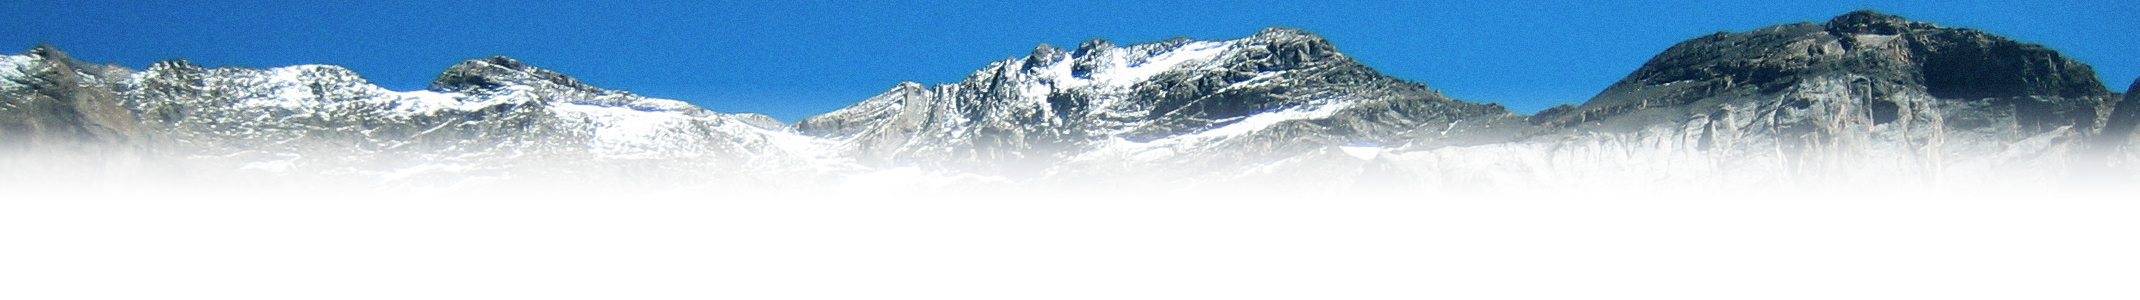 Camping International dans les Hautes Pyrenees